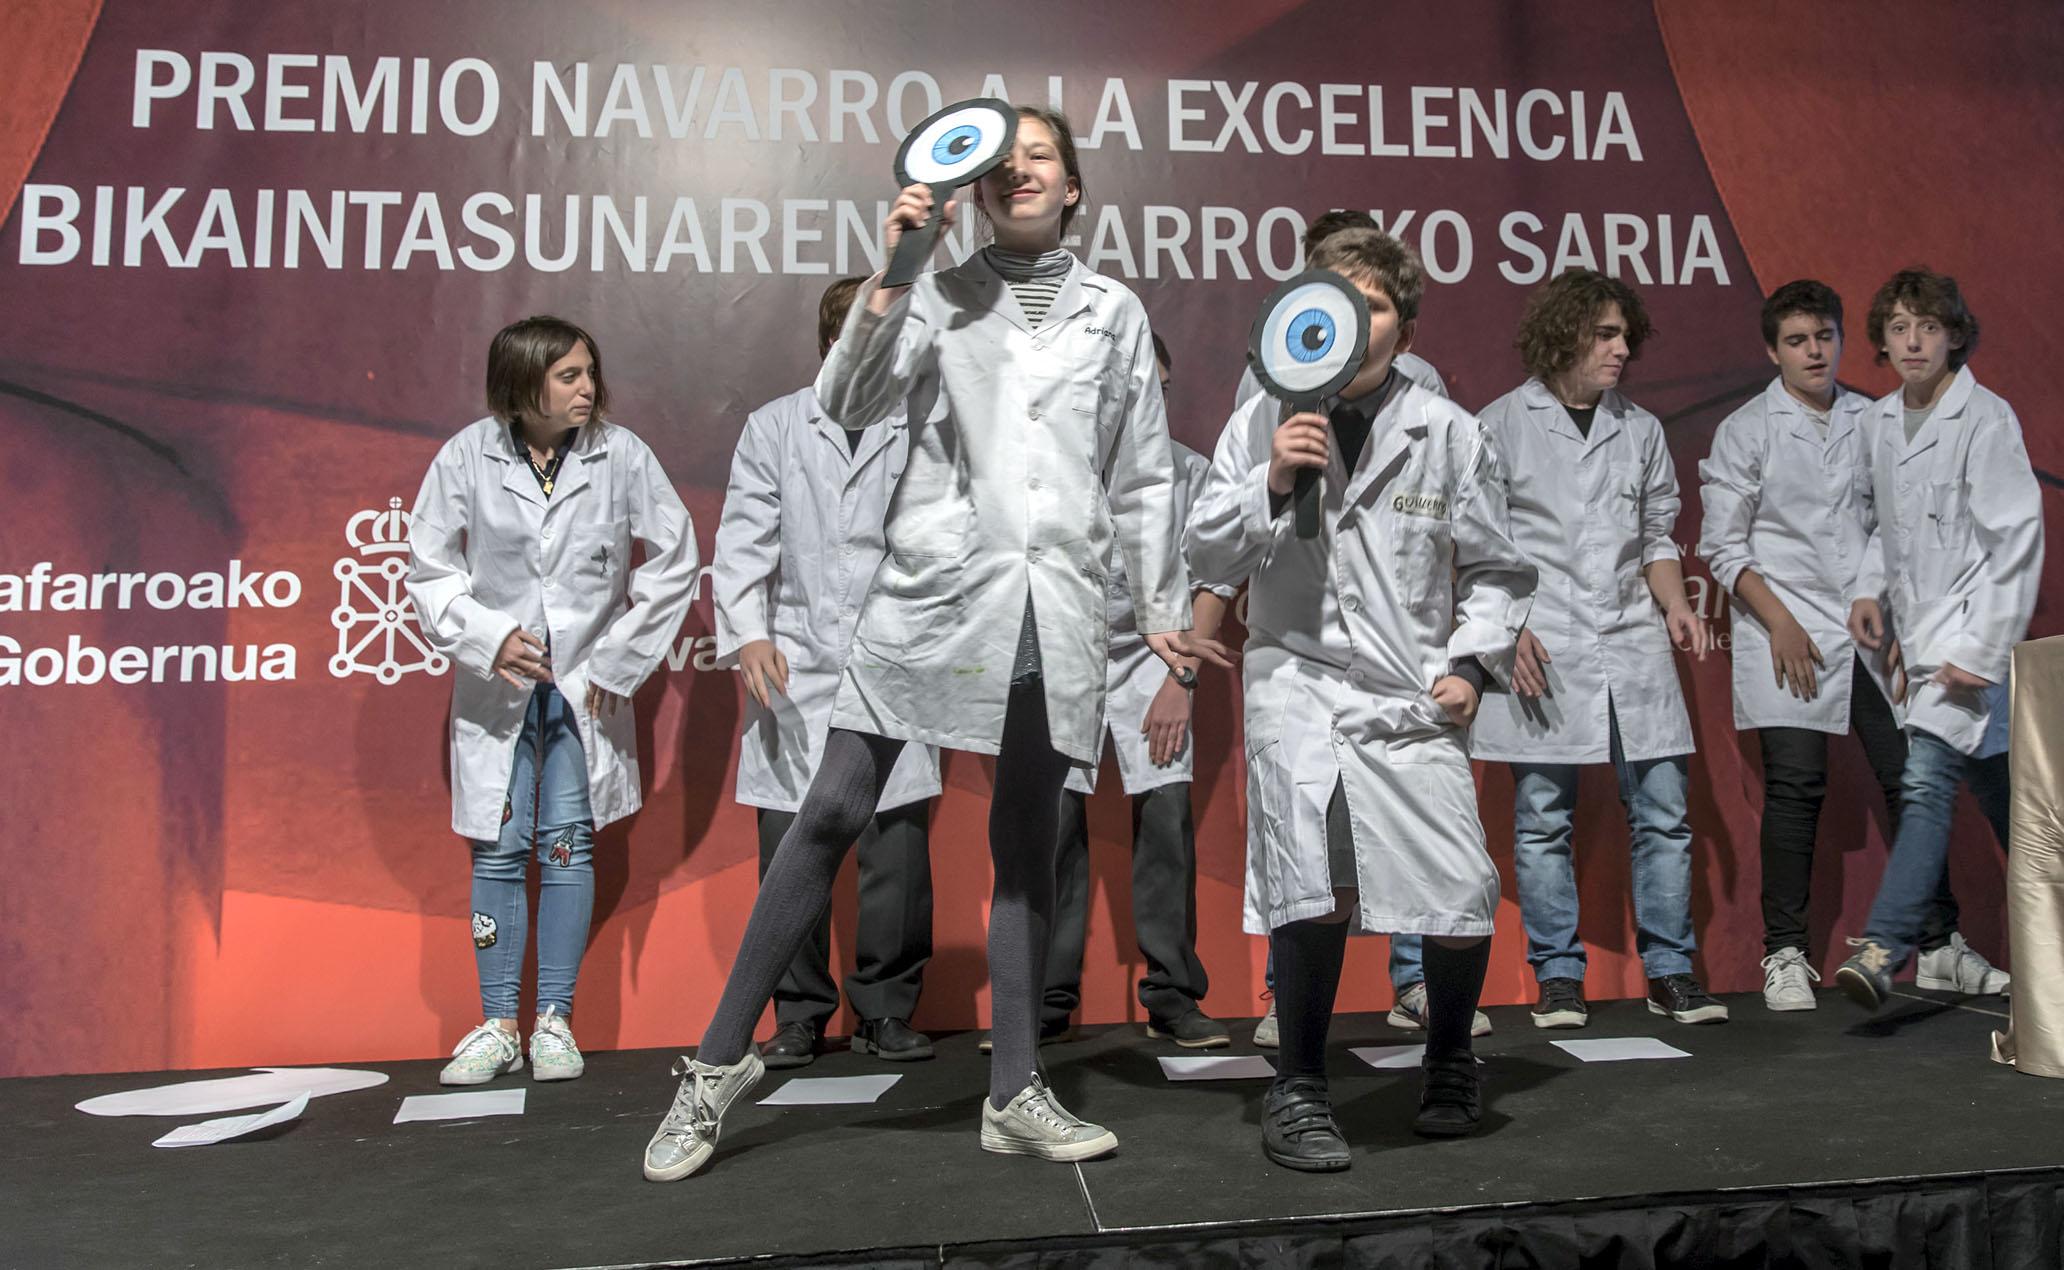 A: Jesús Caso F: 27-11-2017 P: L: Gorraiz T: Premios Excelencia.